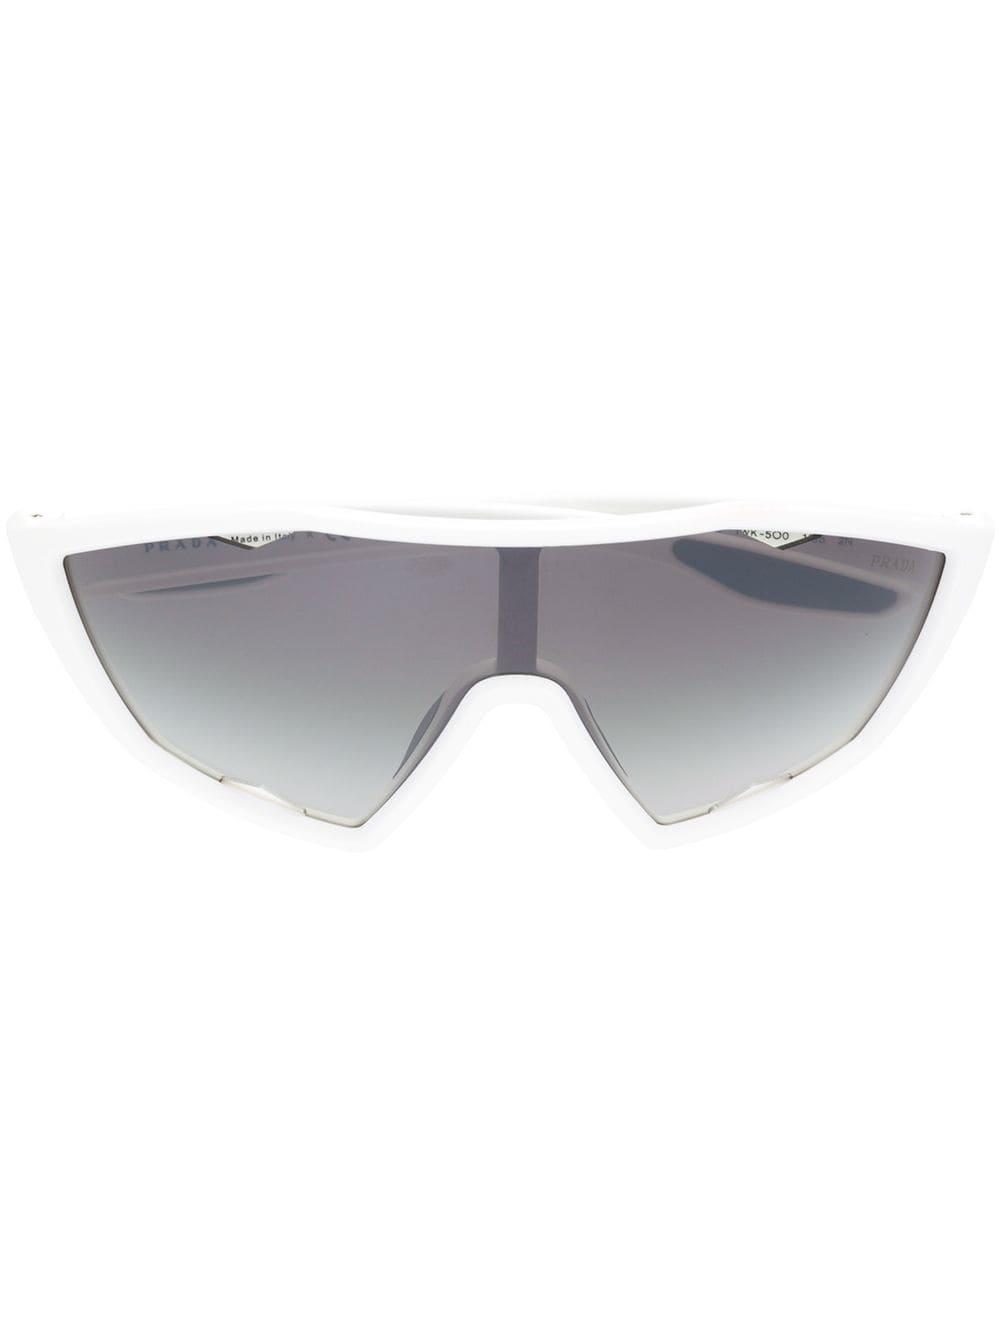 Prada Eyewear Prada Linea Rossa Sunglasses  – Farfetch